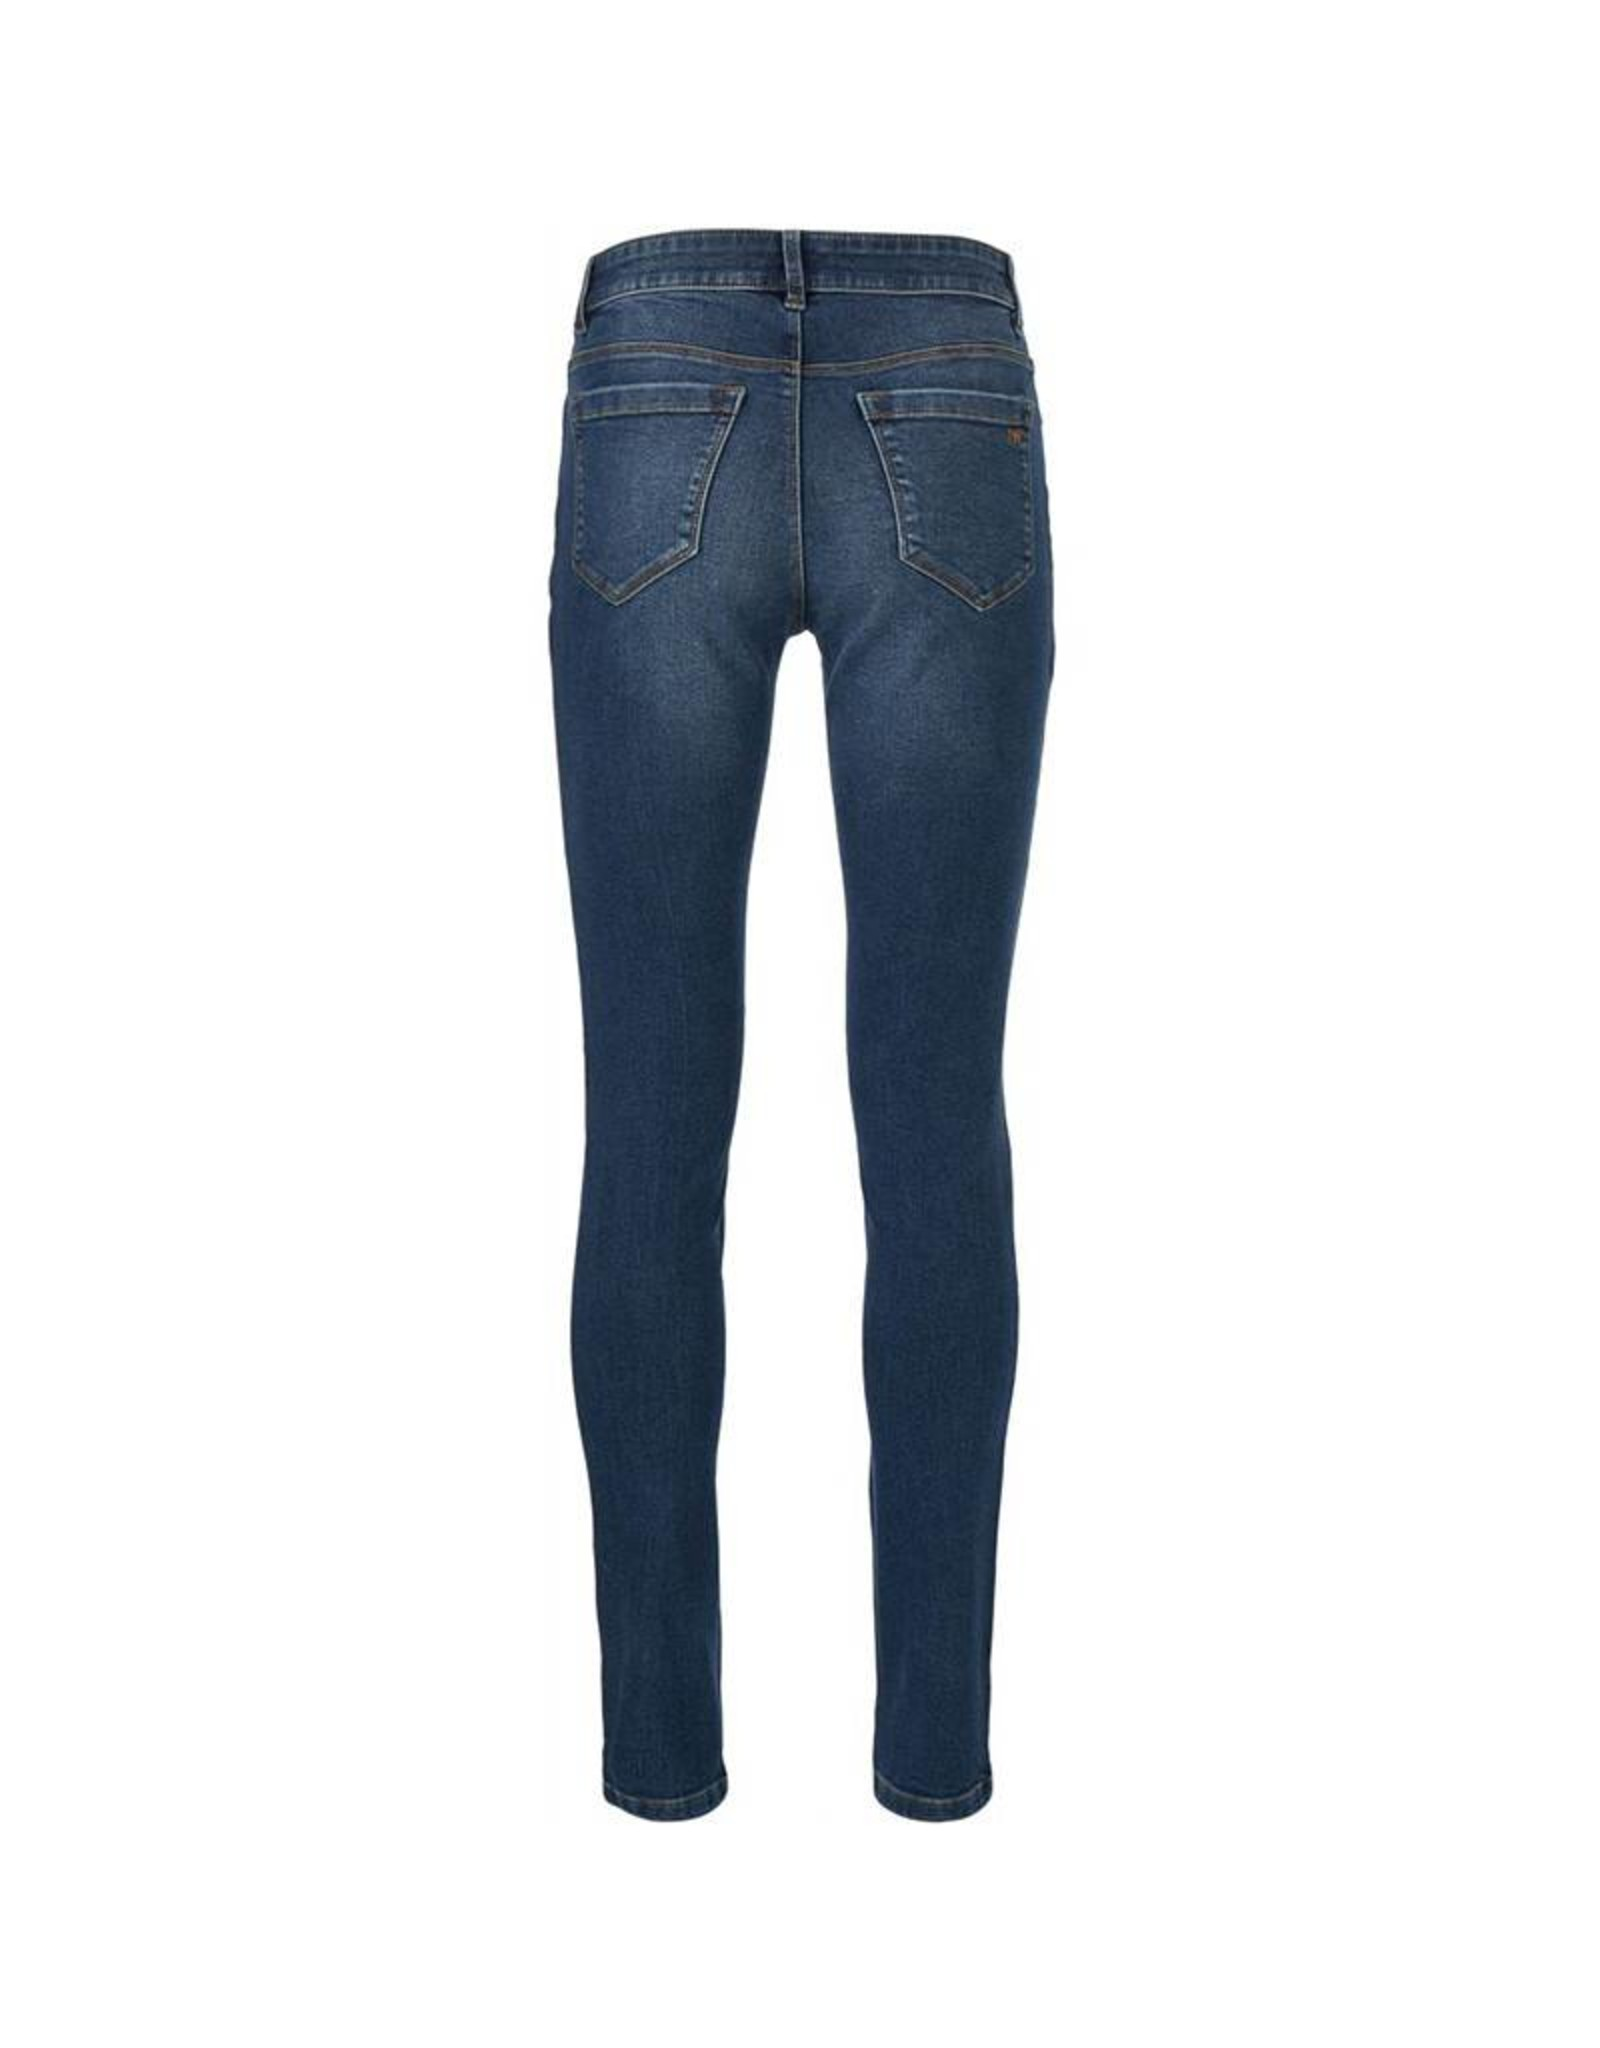 Ivy Rosie jeans